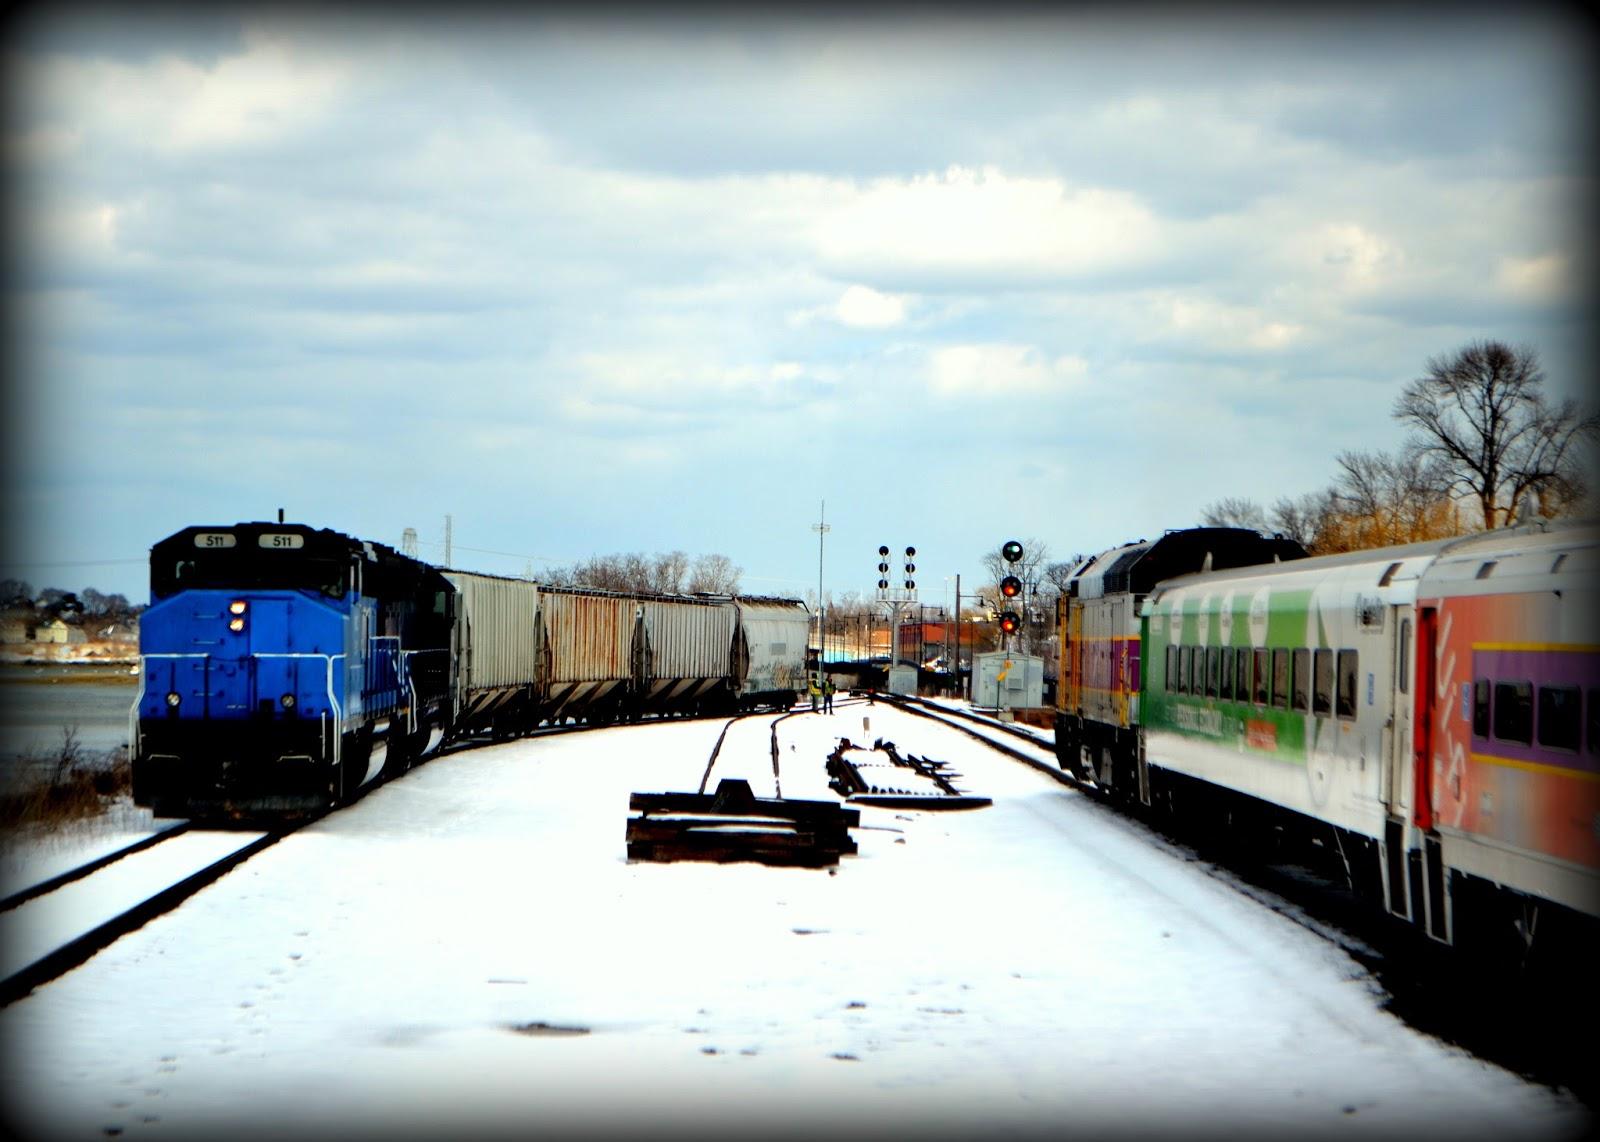 machine, meeting, trains, commuter rail, salem station, salem